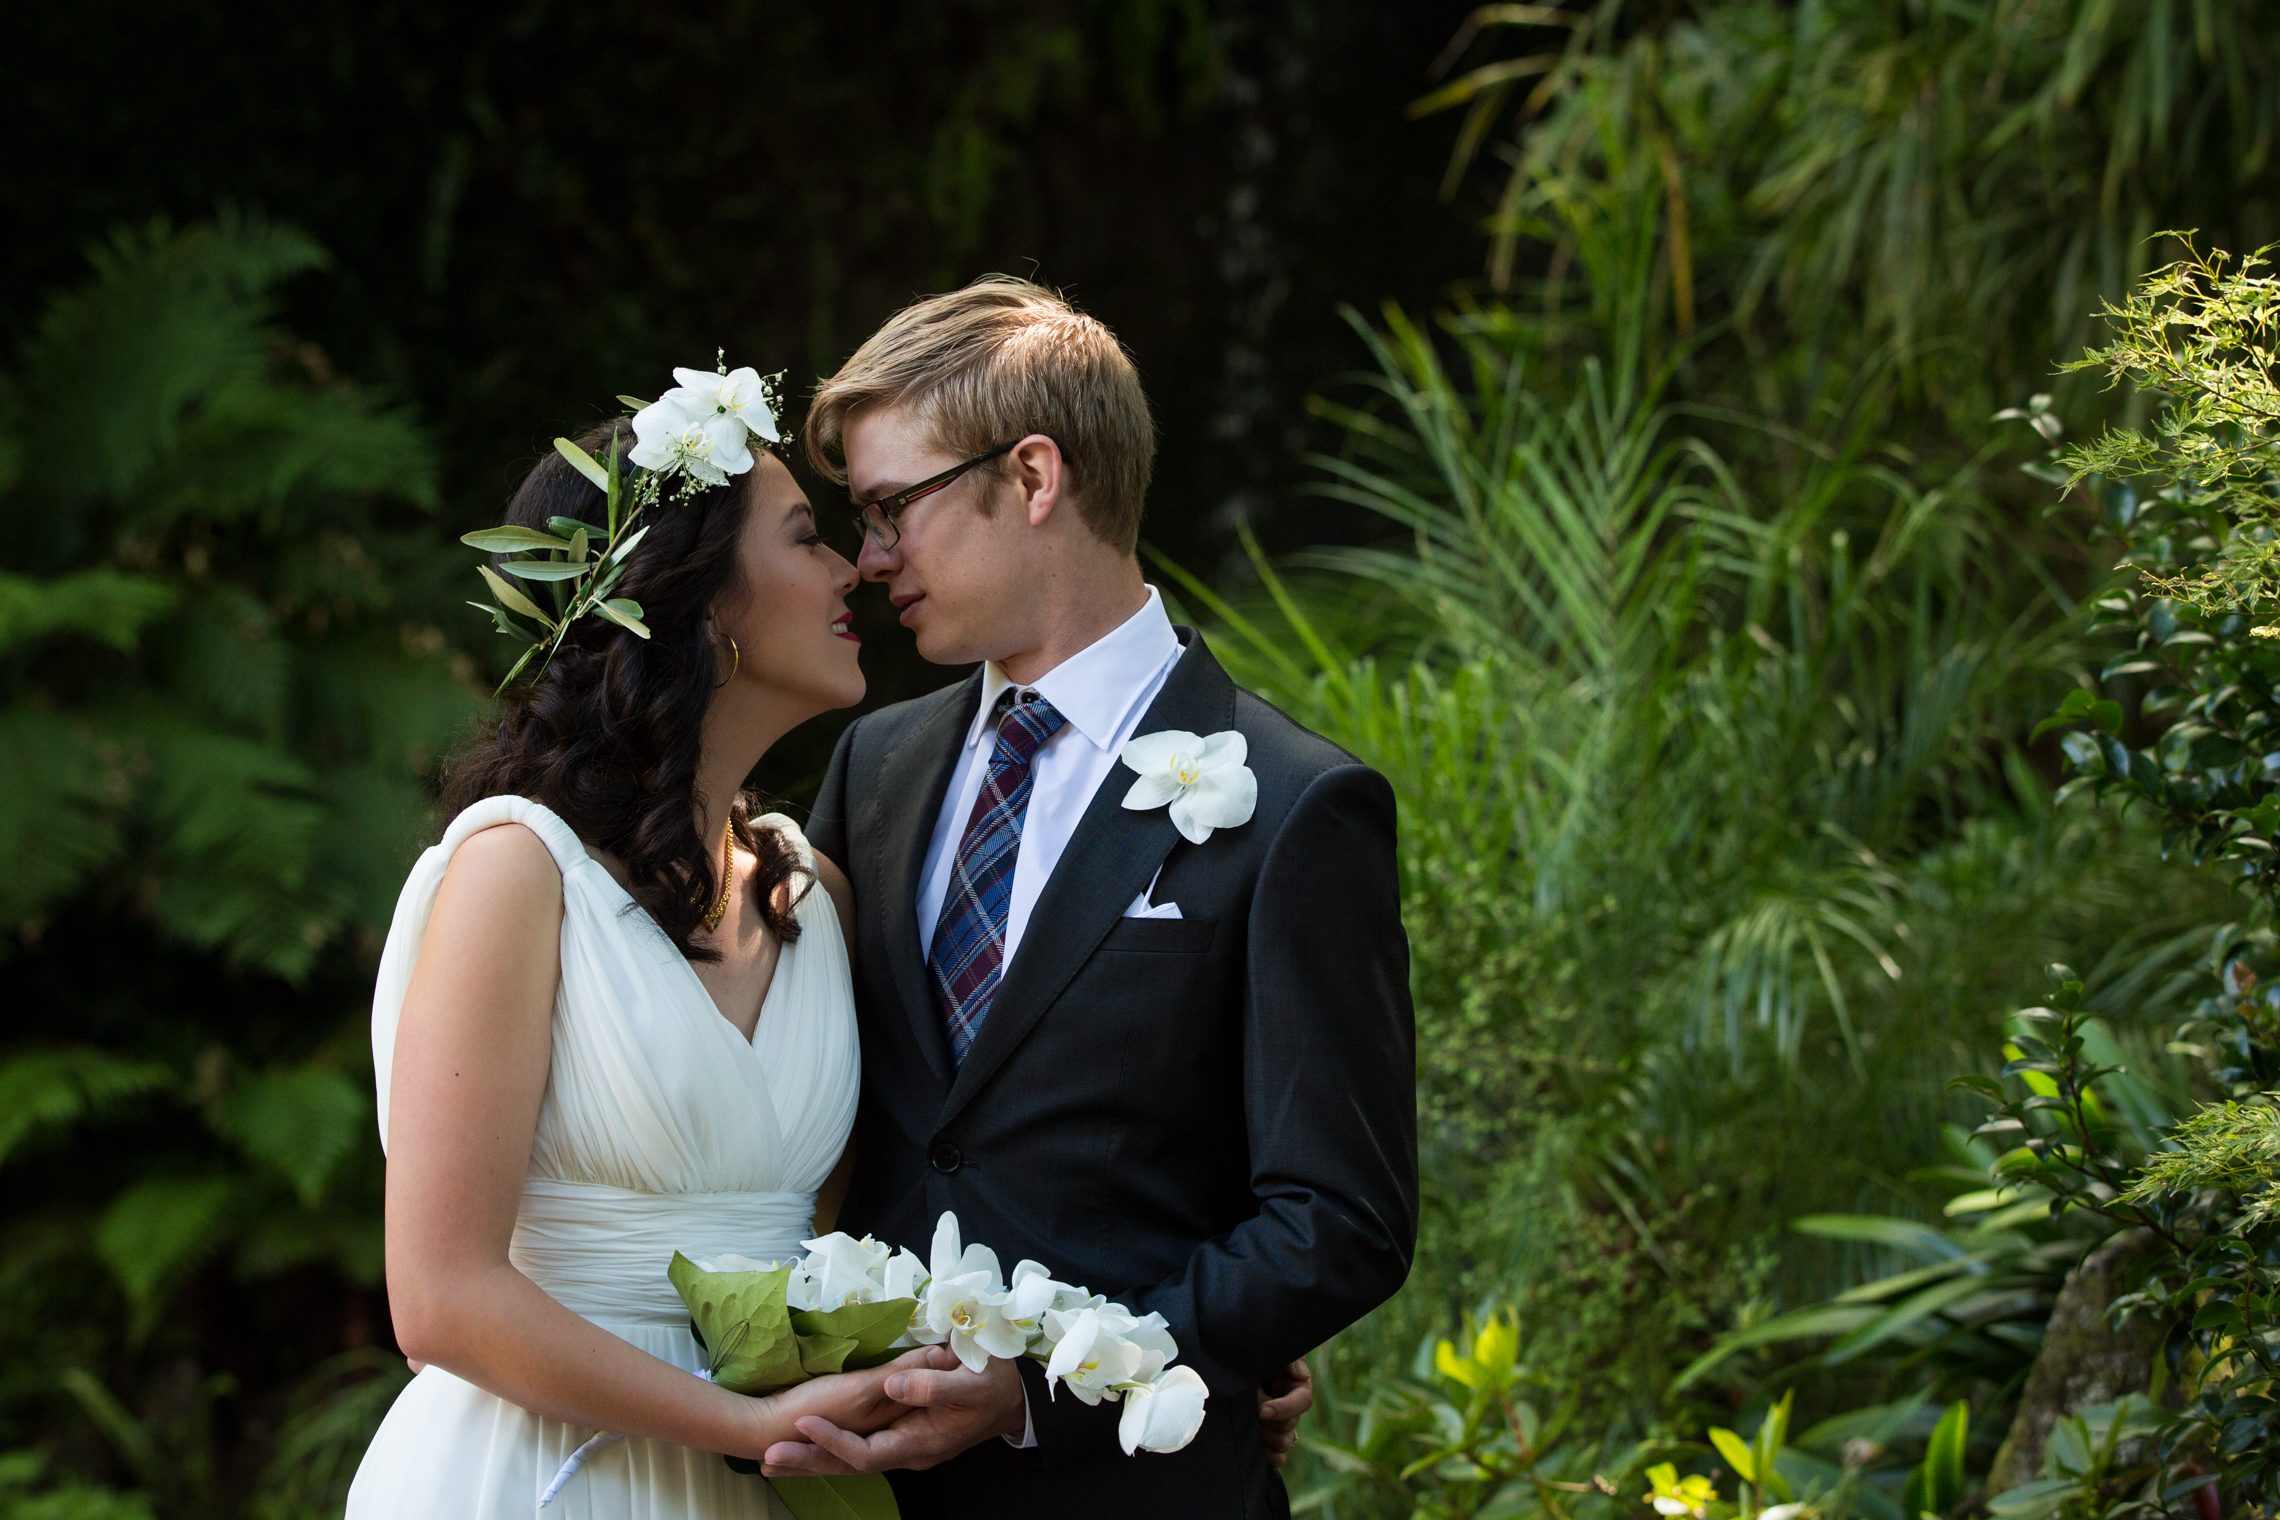 Wedding photographer Auckland testimonial-4